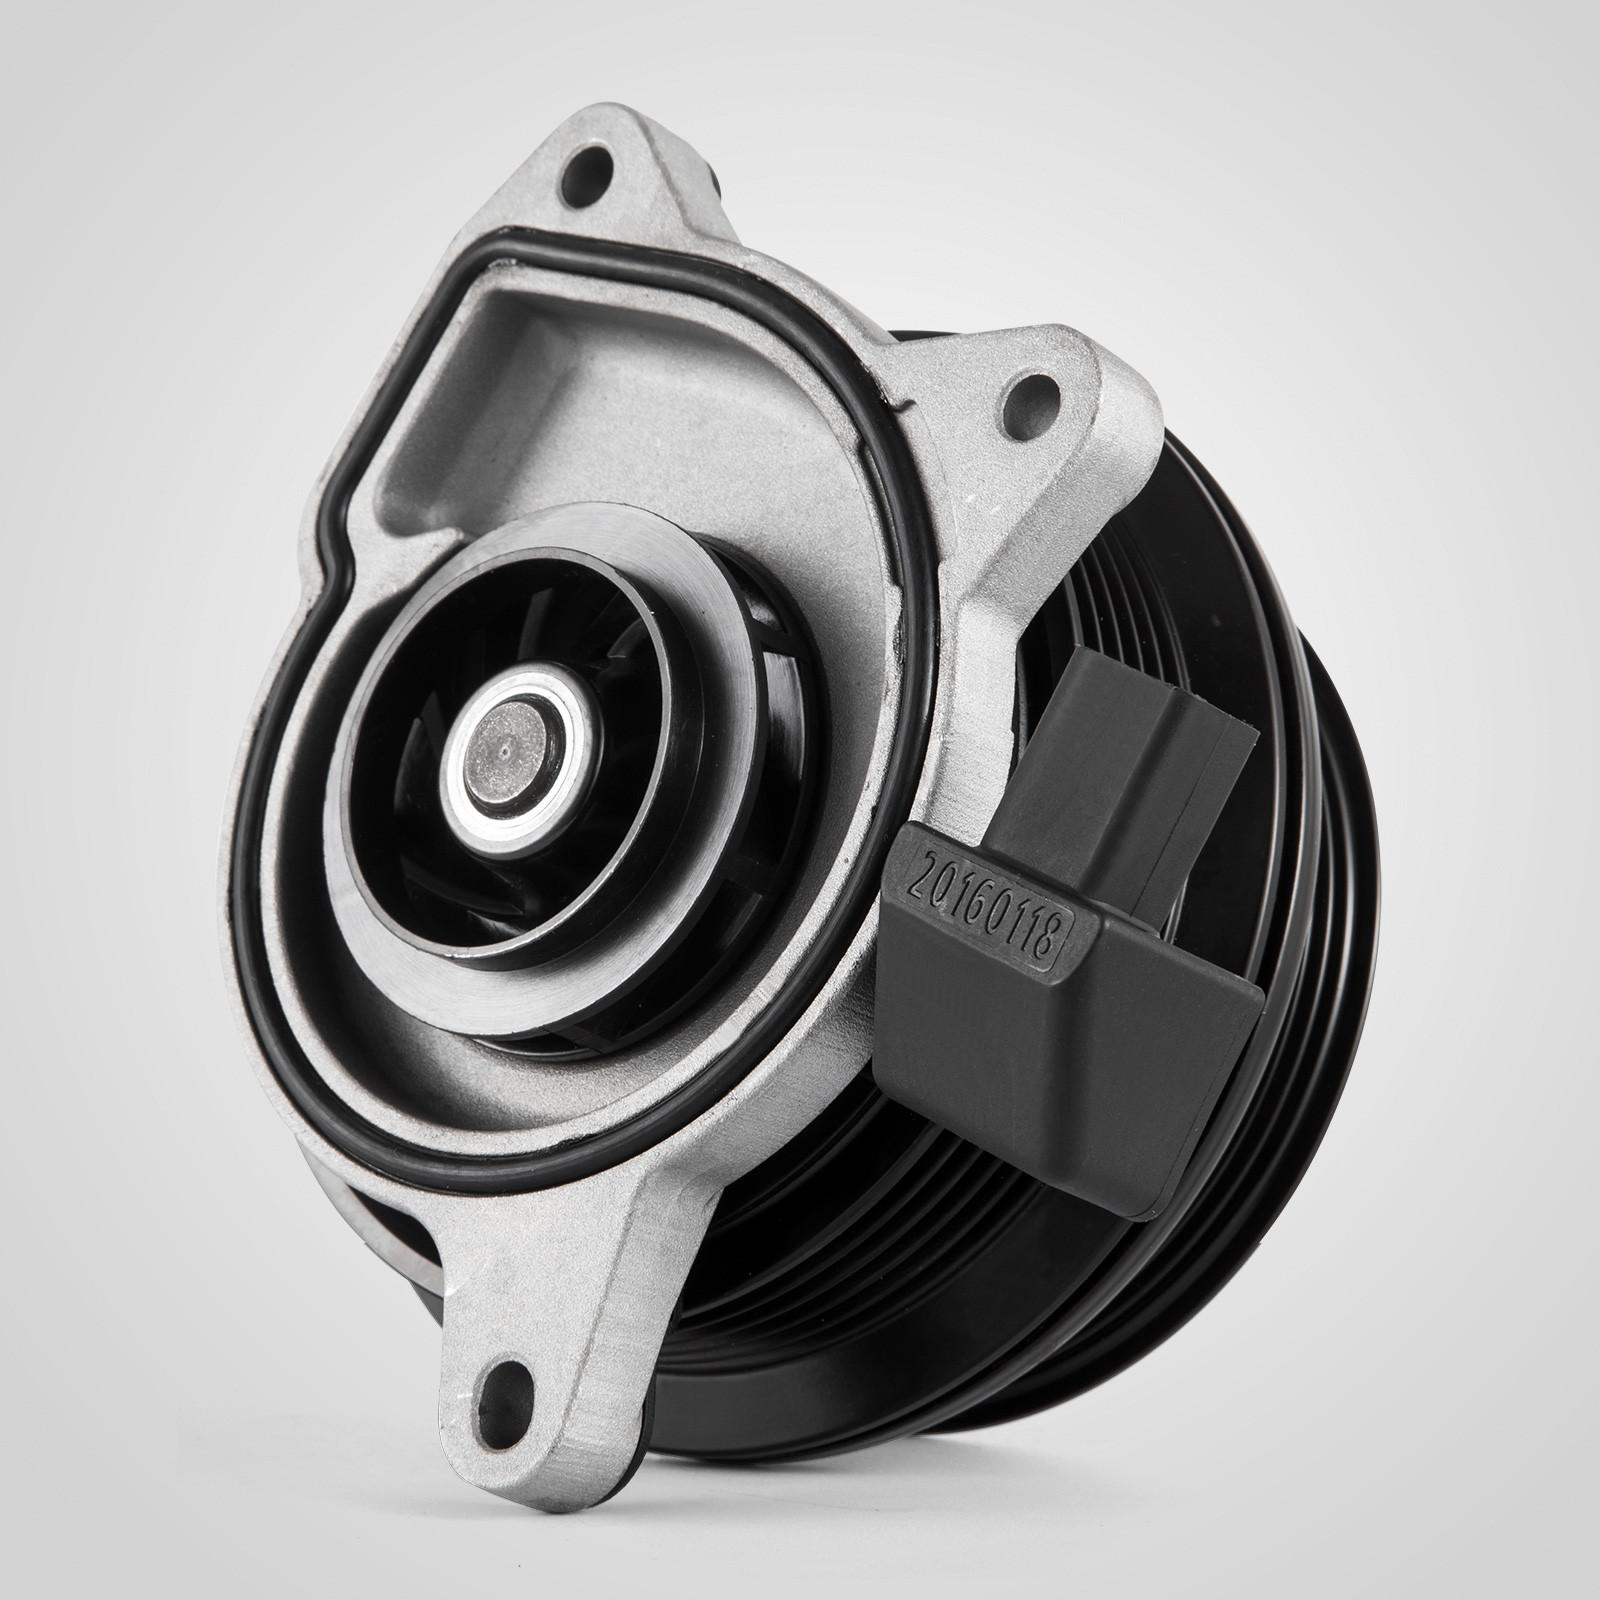 medium resolution of 8 new volkswagen audi skoda golf mk6 beetle water pump